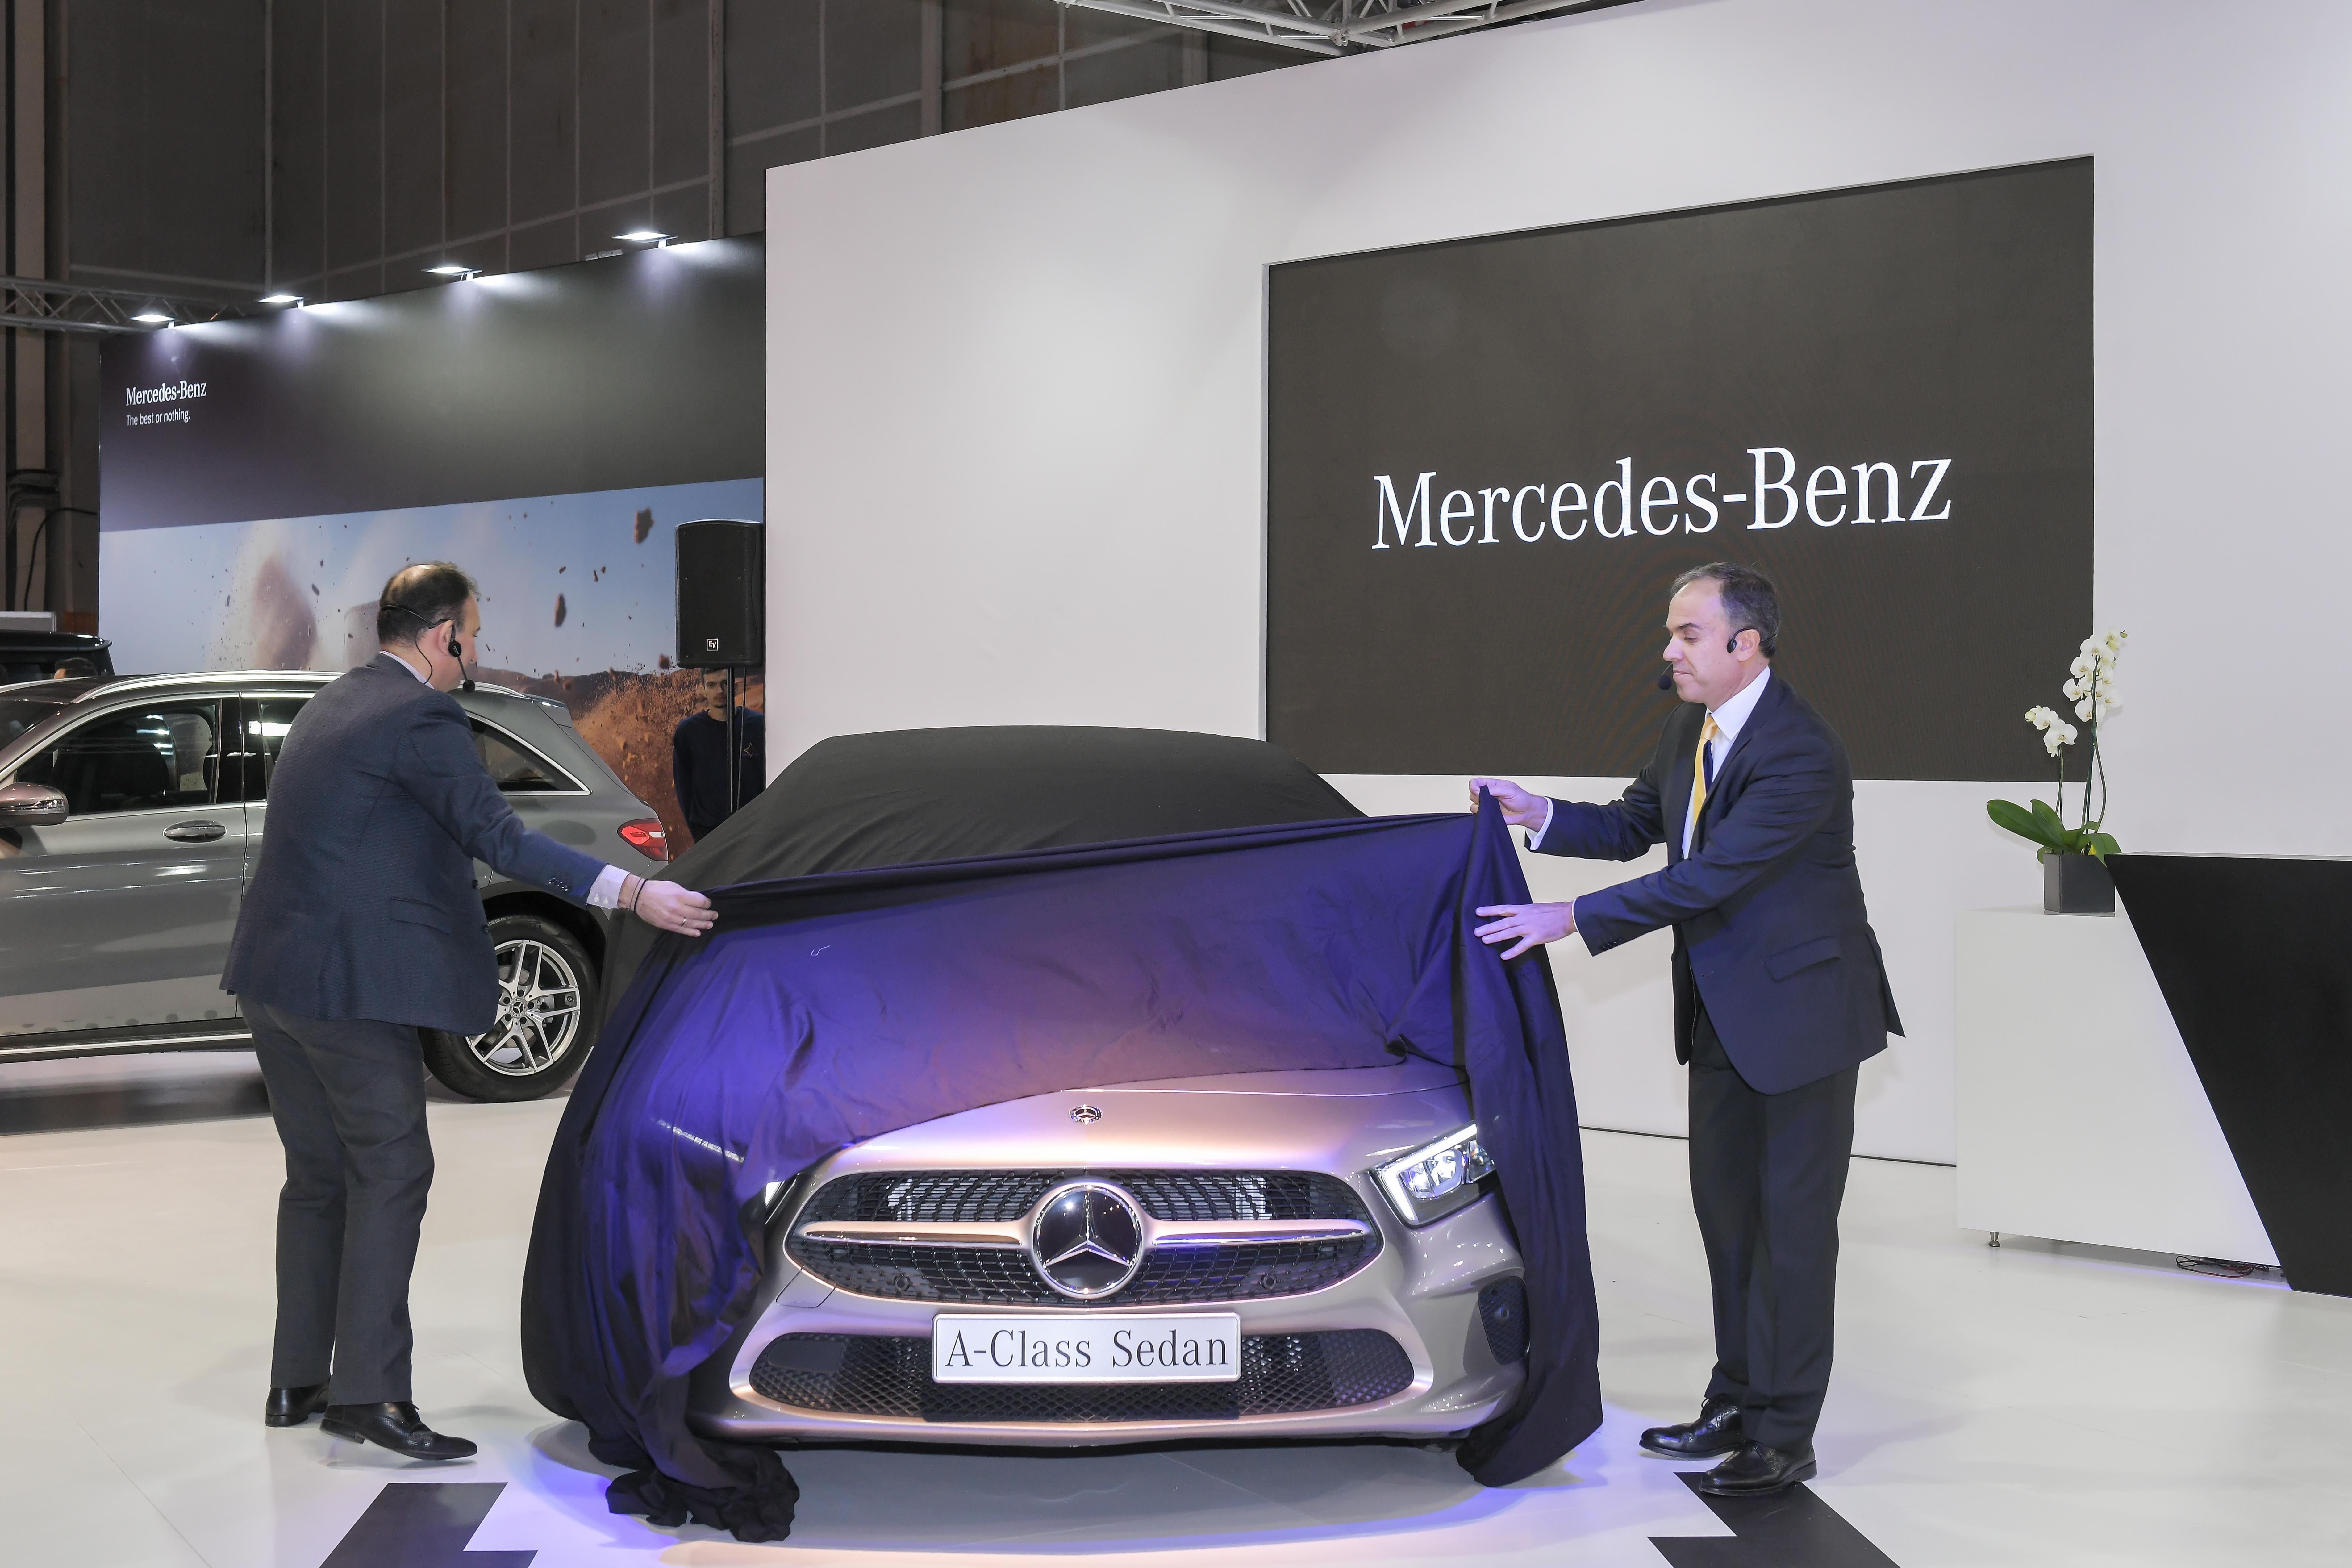 H Mercedes-Benz Ελλάς στην Αυτοκίνηση-ΕΚΟ 2018 αποκάλυψε την νέα Α-Class Sedan